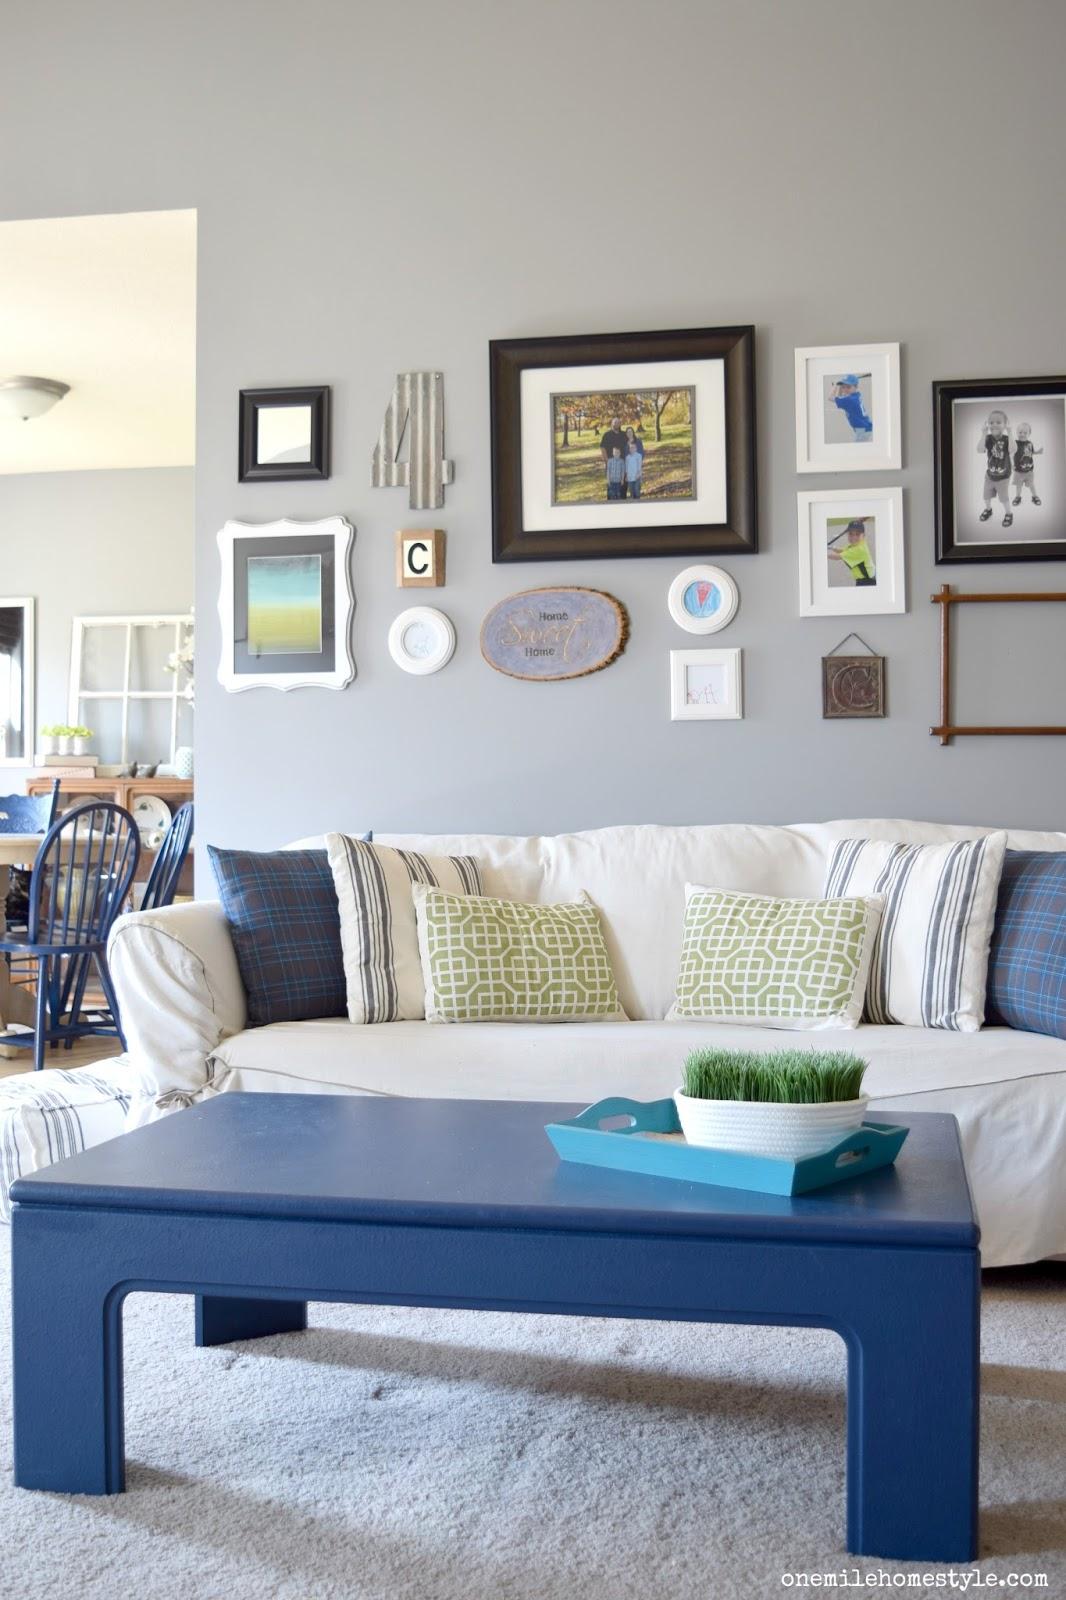 Inspiring Spaces - Beautiful Grey Rooms (Part 1)